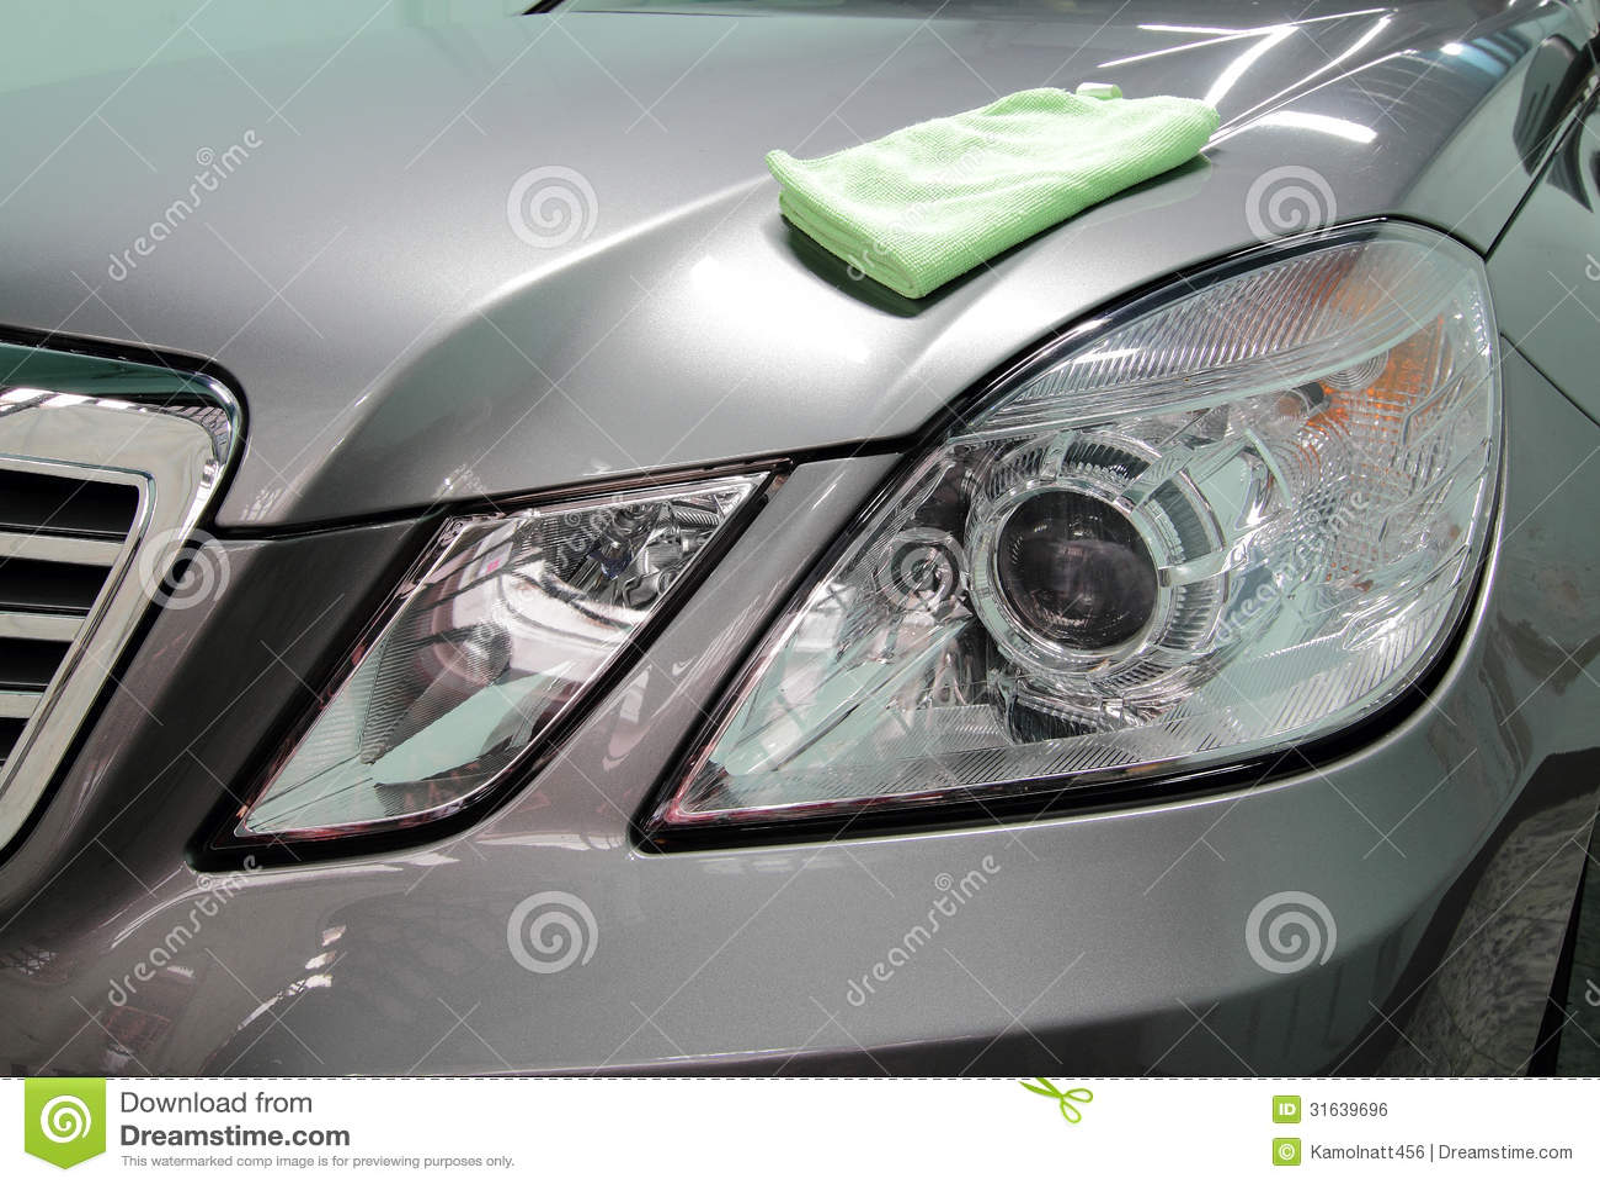 LensDoctor® Headlight Restoration Professionals